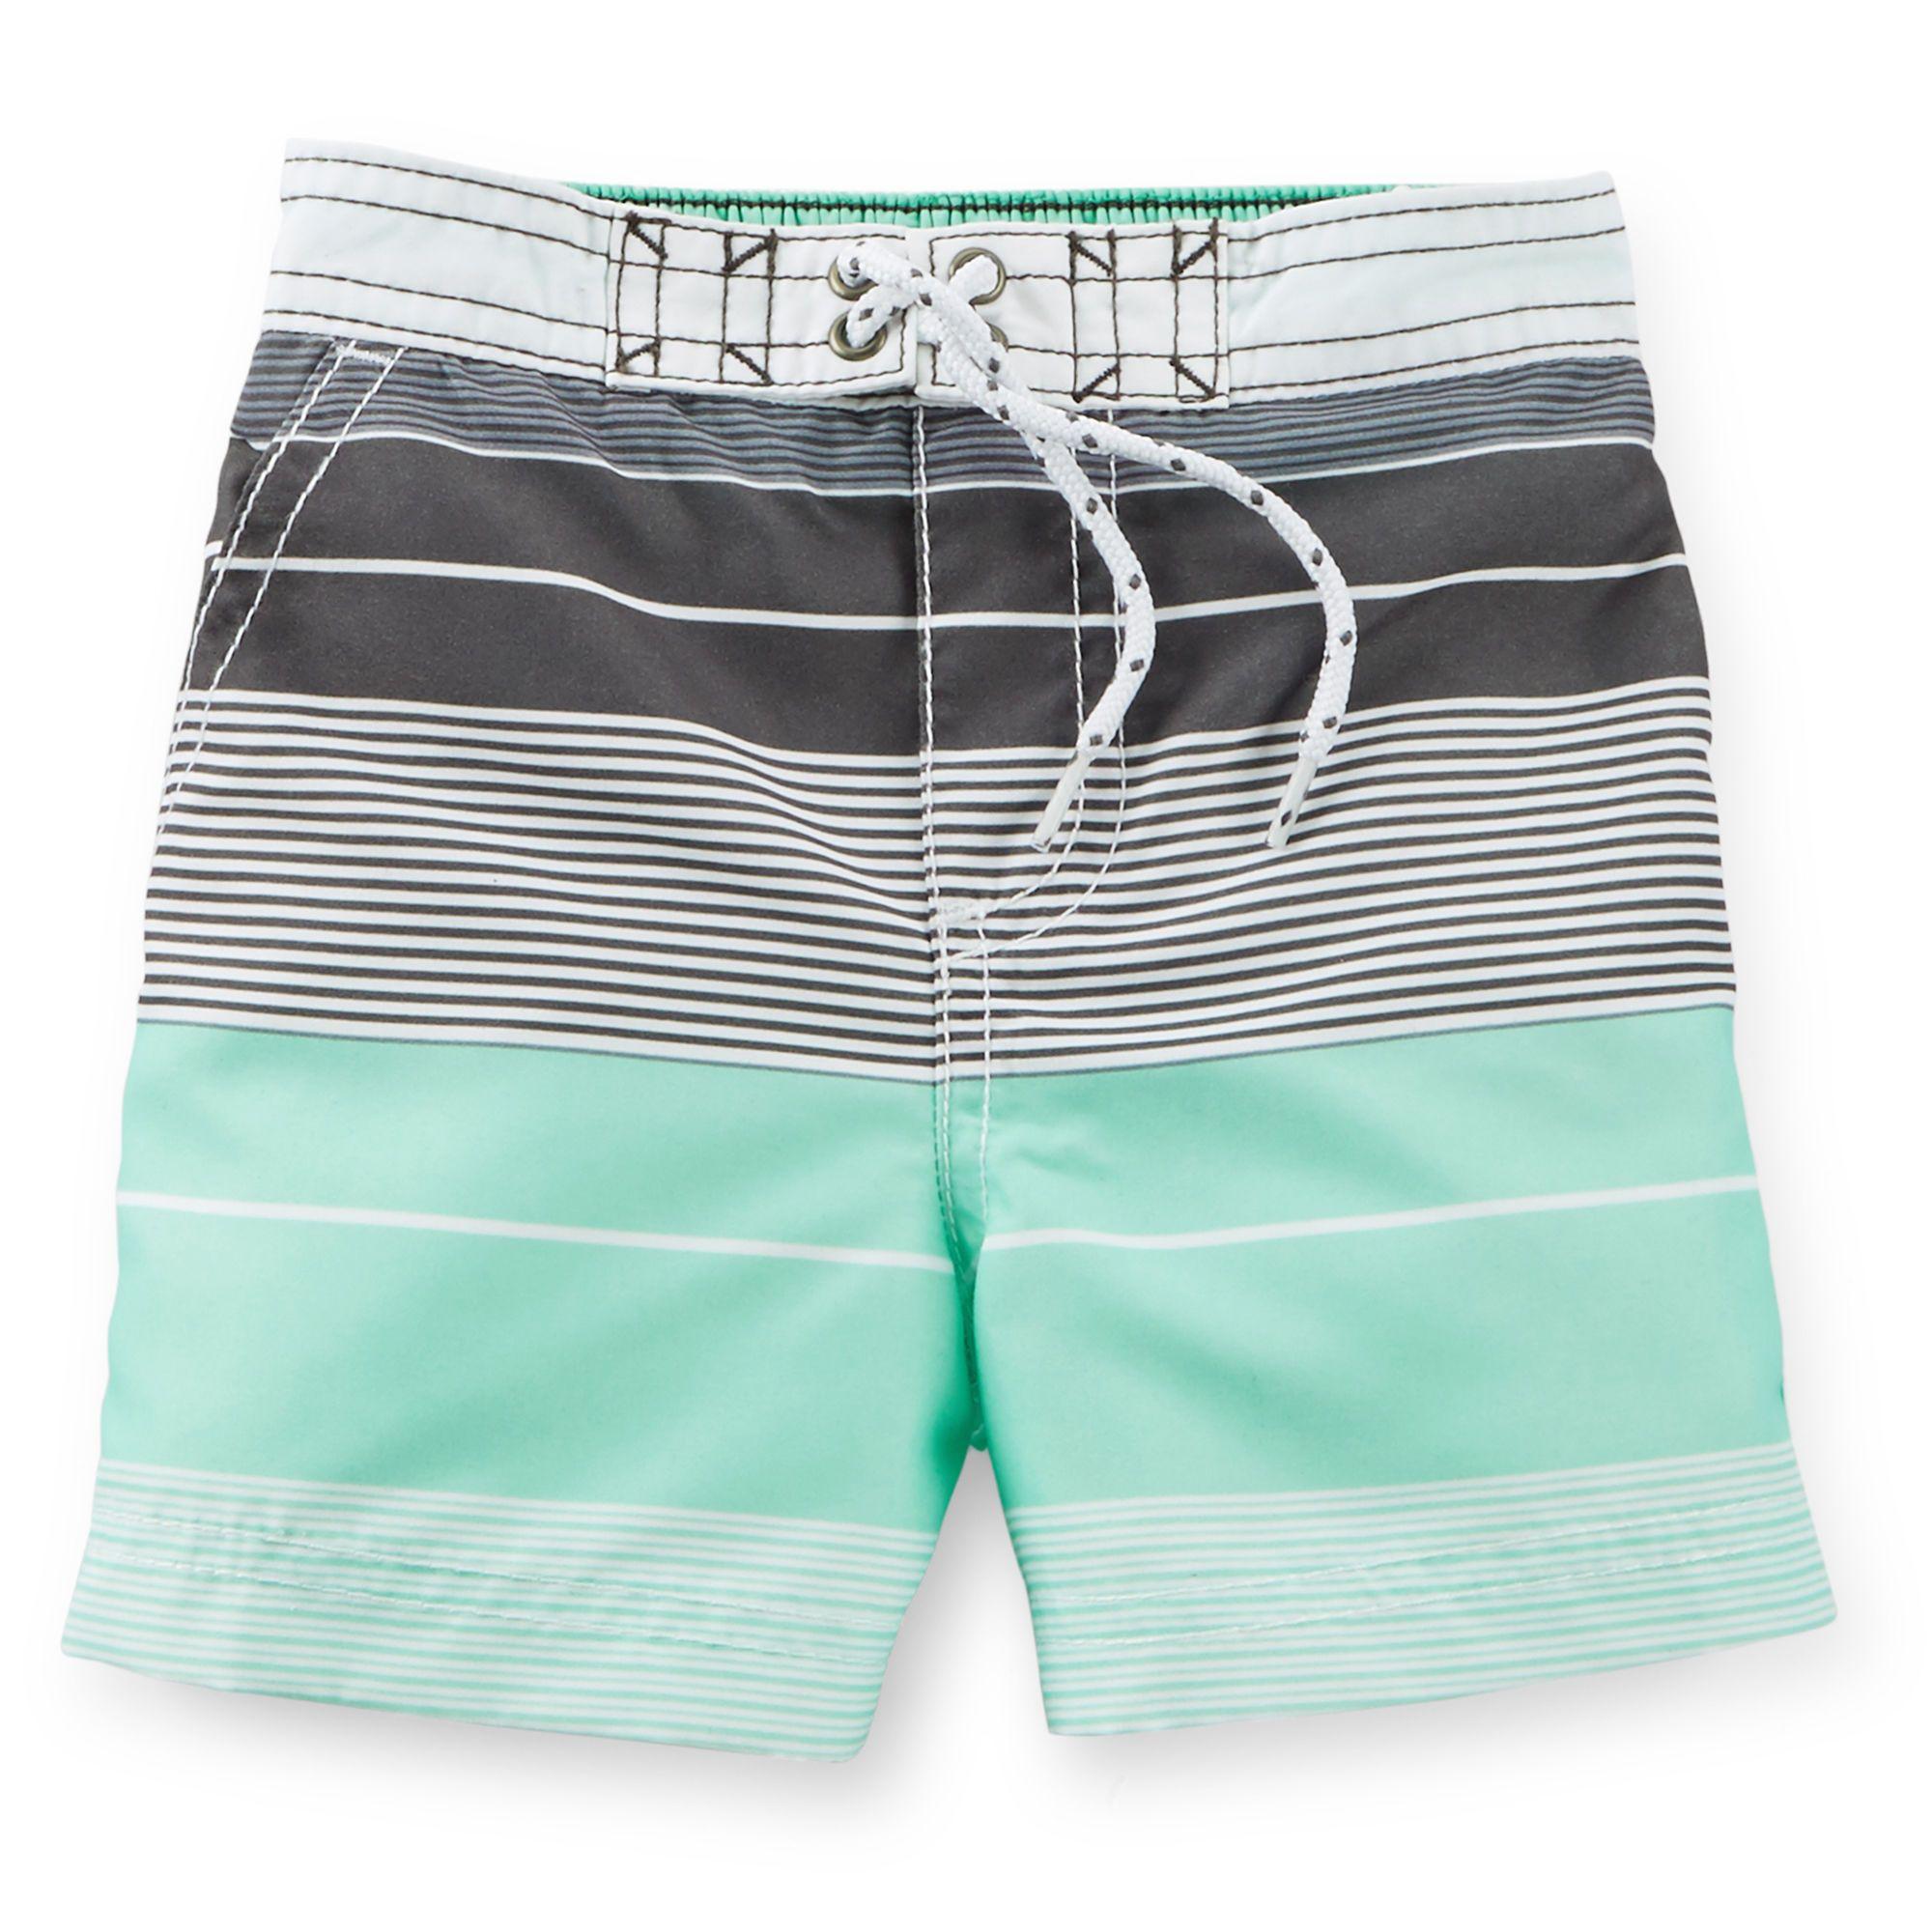 Striped Swim Trunks Carters Baby stuff Pinterest